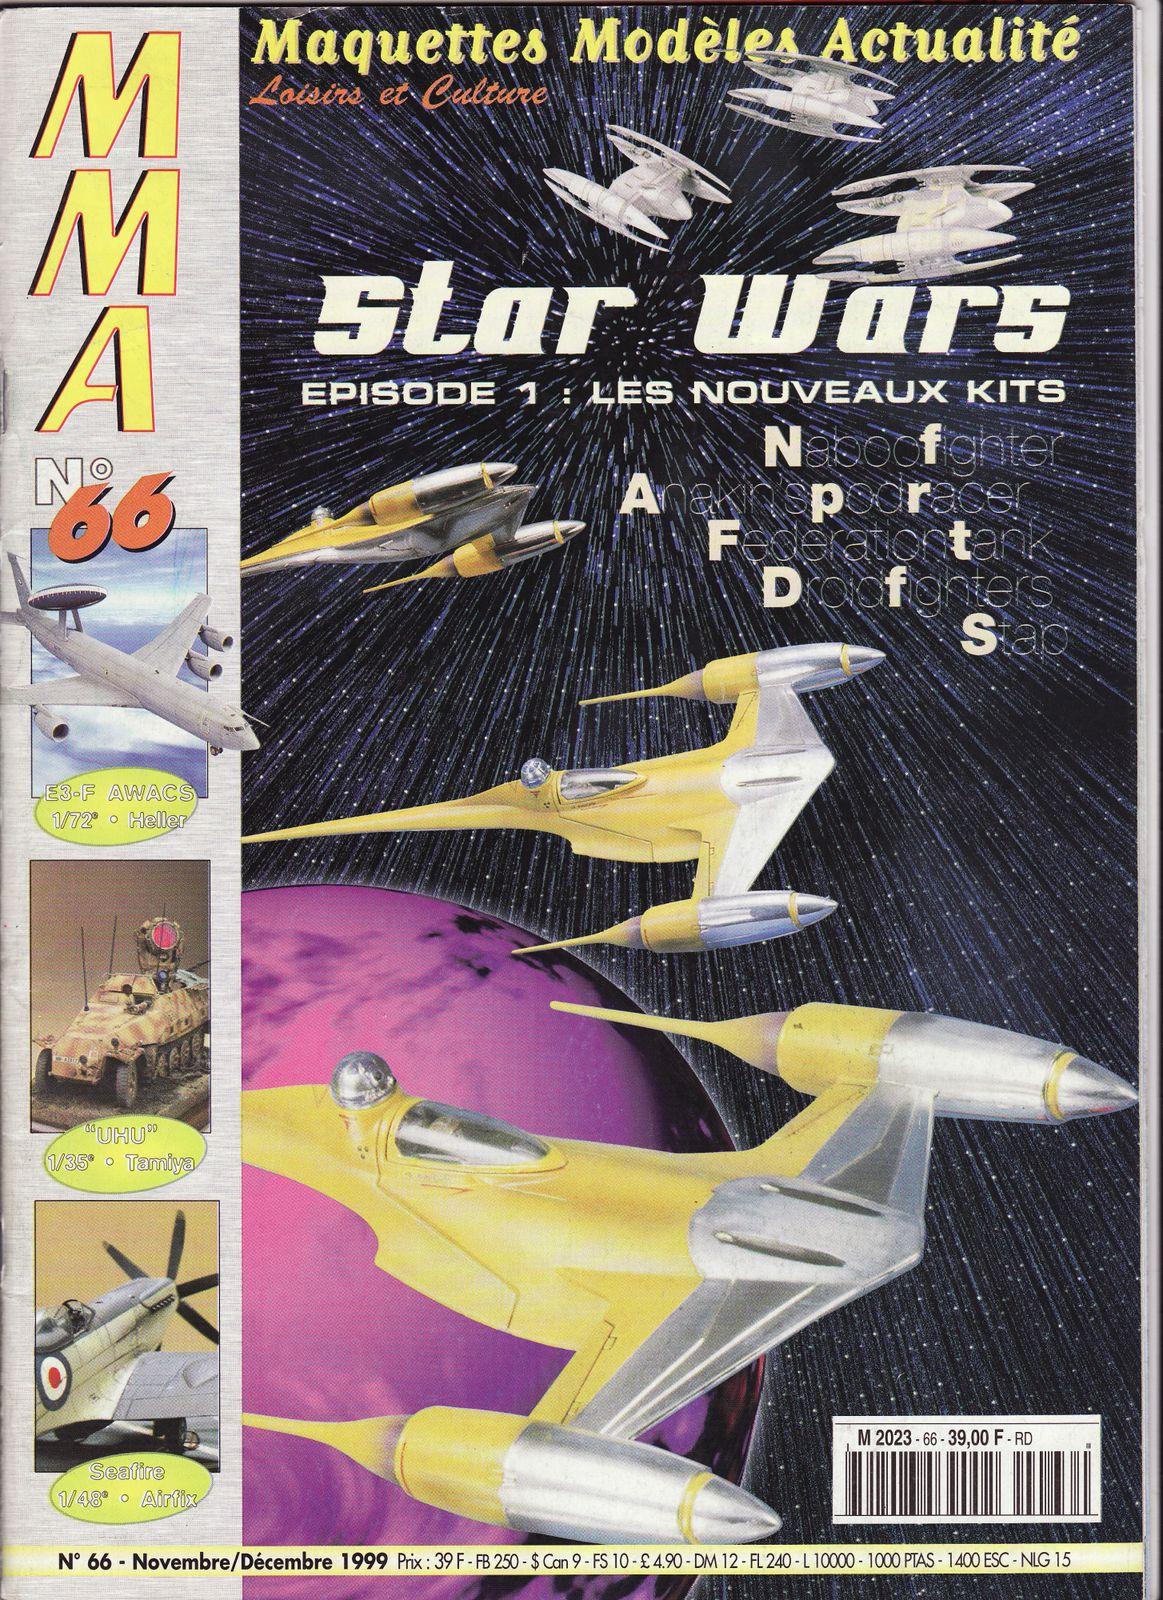 00 star wars